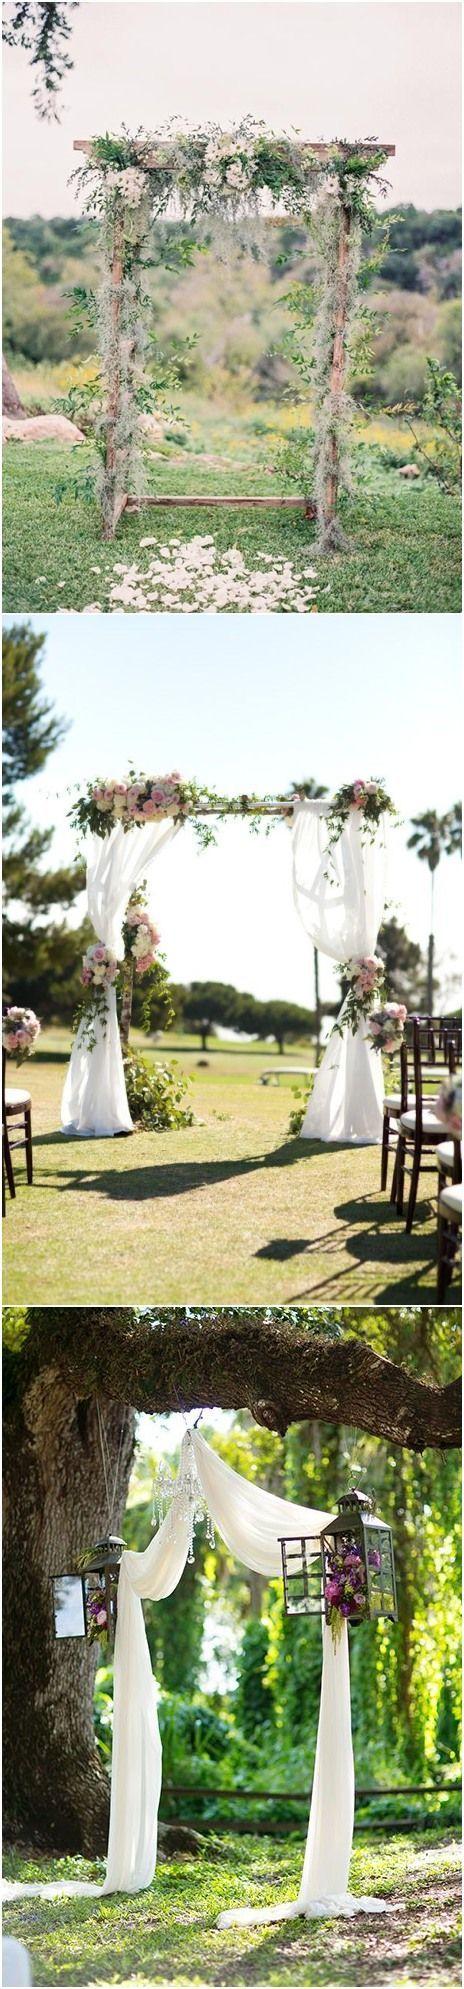 25 Cute Outdoor Wedding Arches Ideas On Pinterest